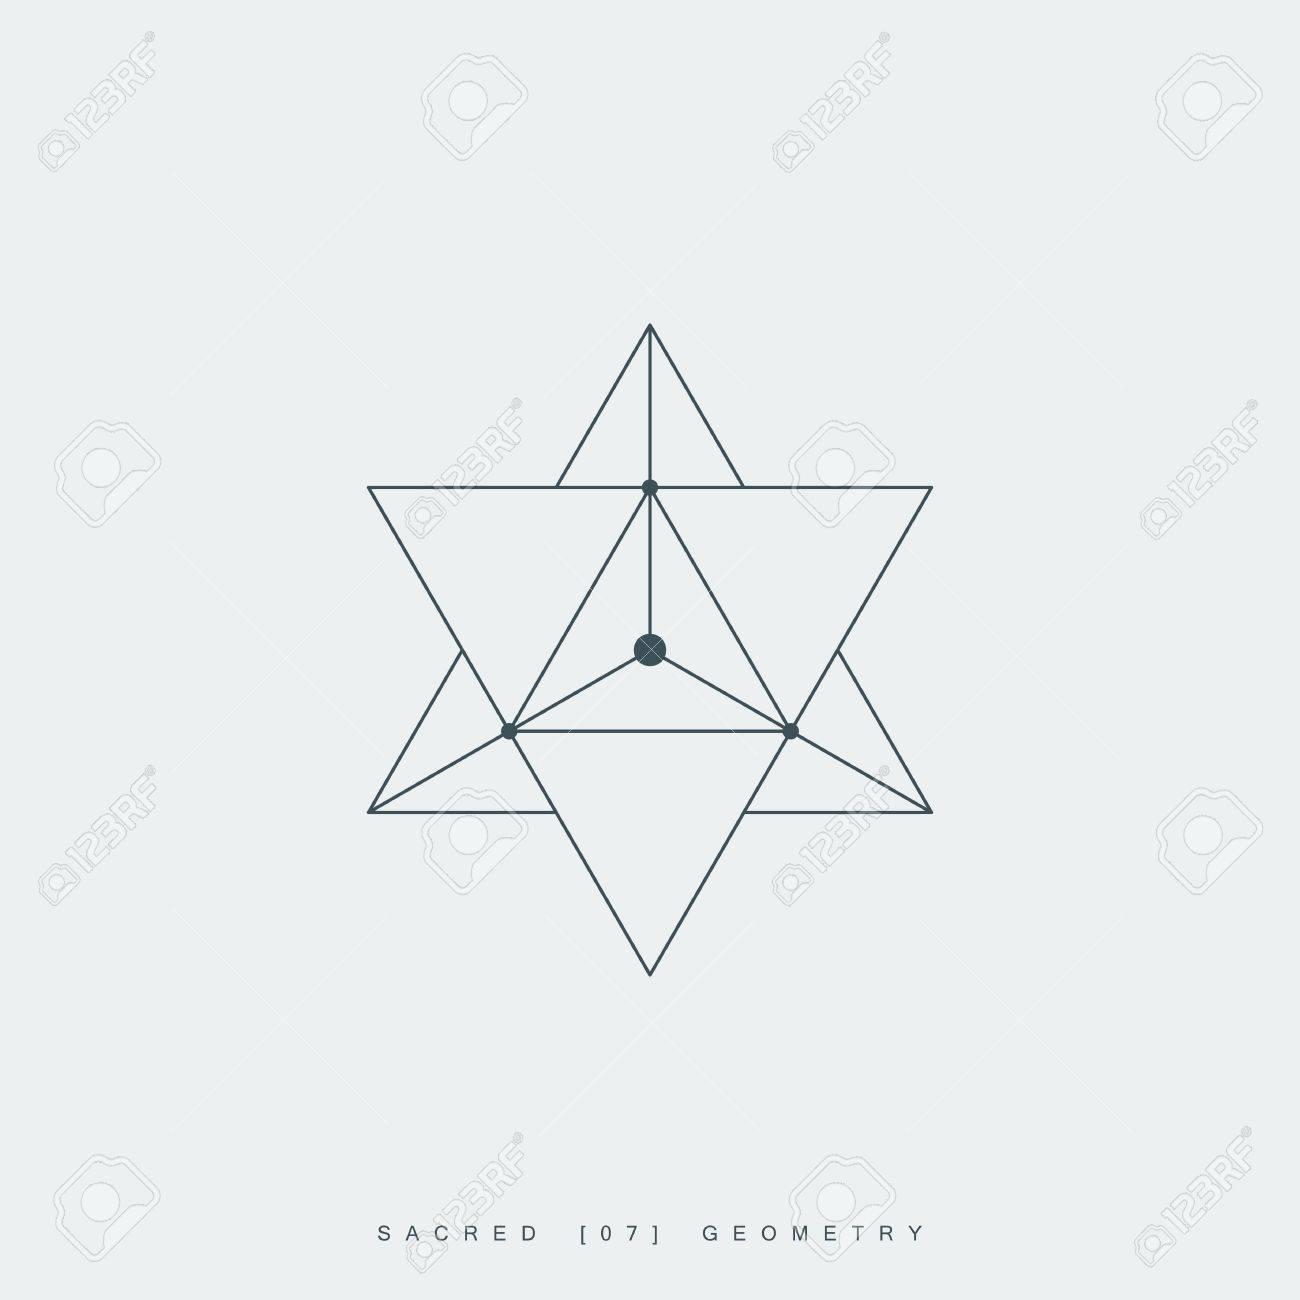 Heilige Geometrie Merkaba Dünne Linie Geometrischen Dreiecksform